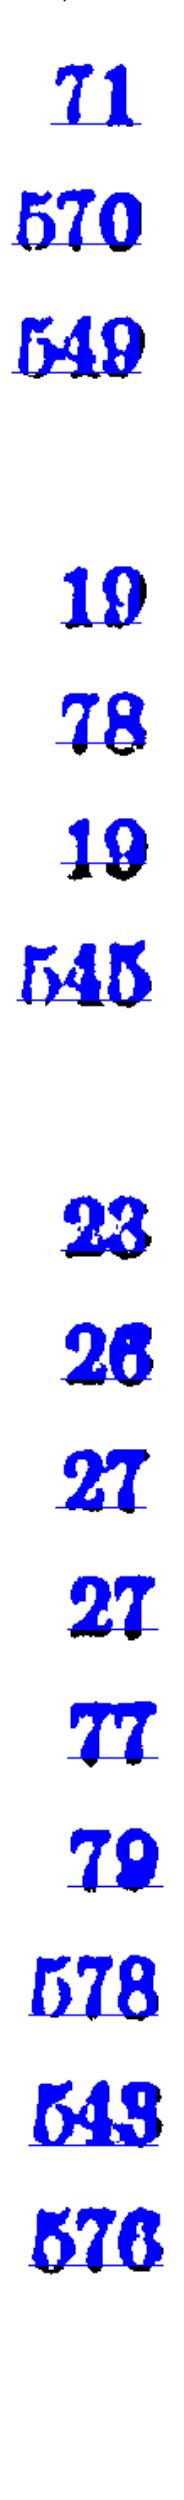 [ocr errors][merged small][merged small][merged small][merged small][merged small][merged small][merged small][ocr errors][merged small][merged small][ocr errors][merged small][ocr errors][merged small][merged small]